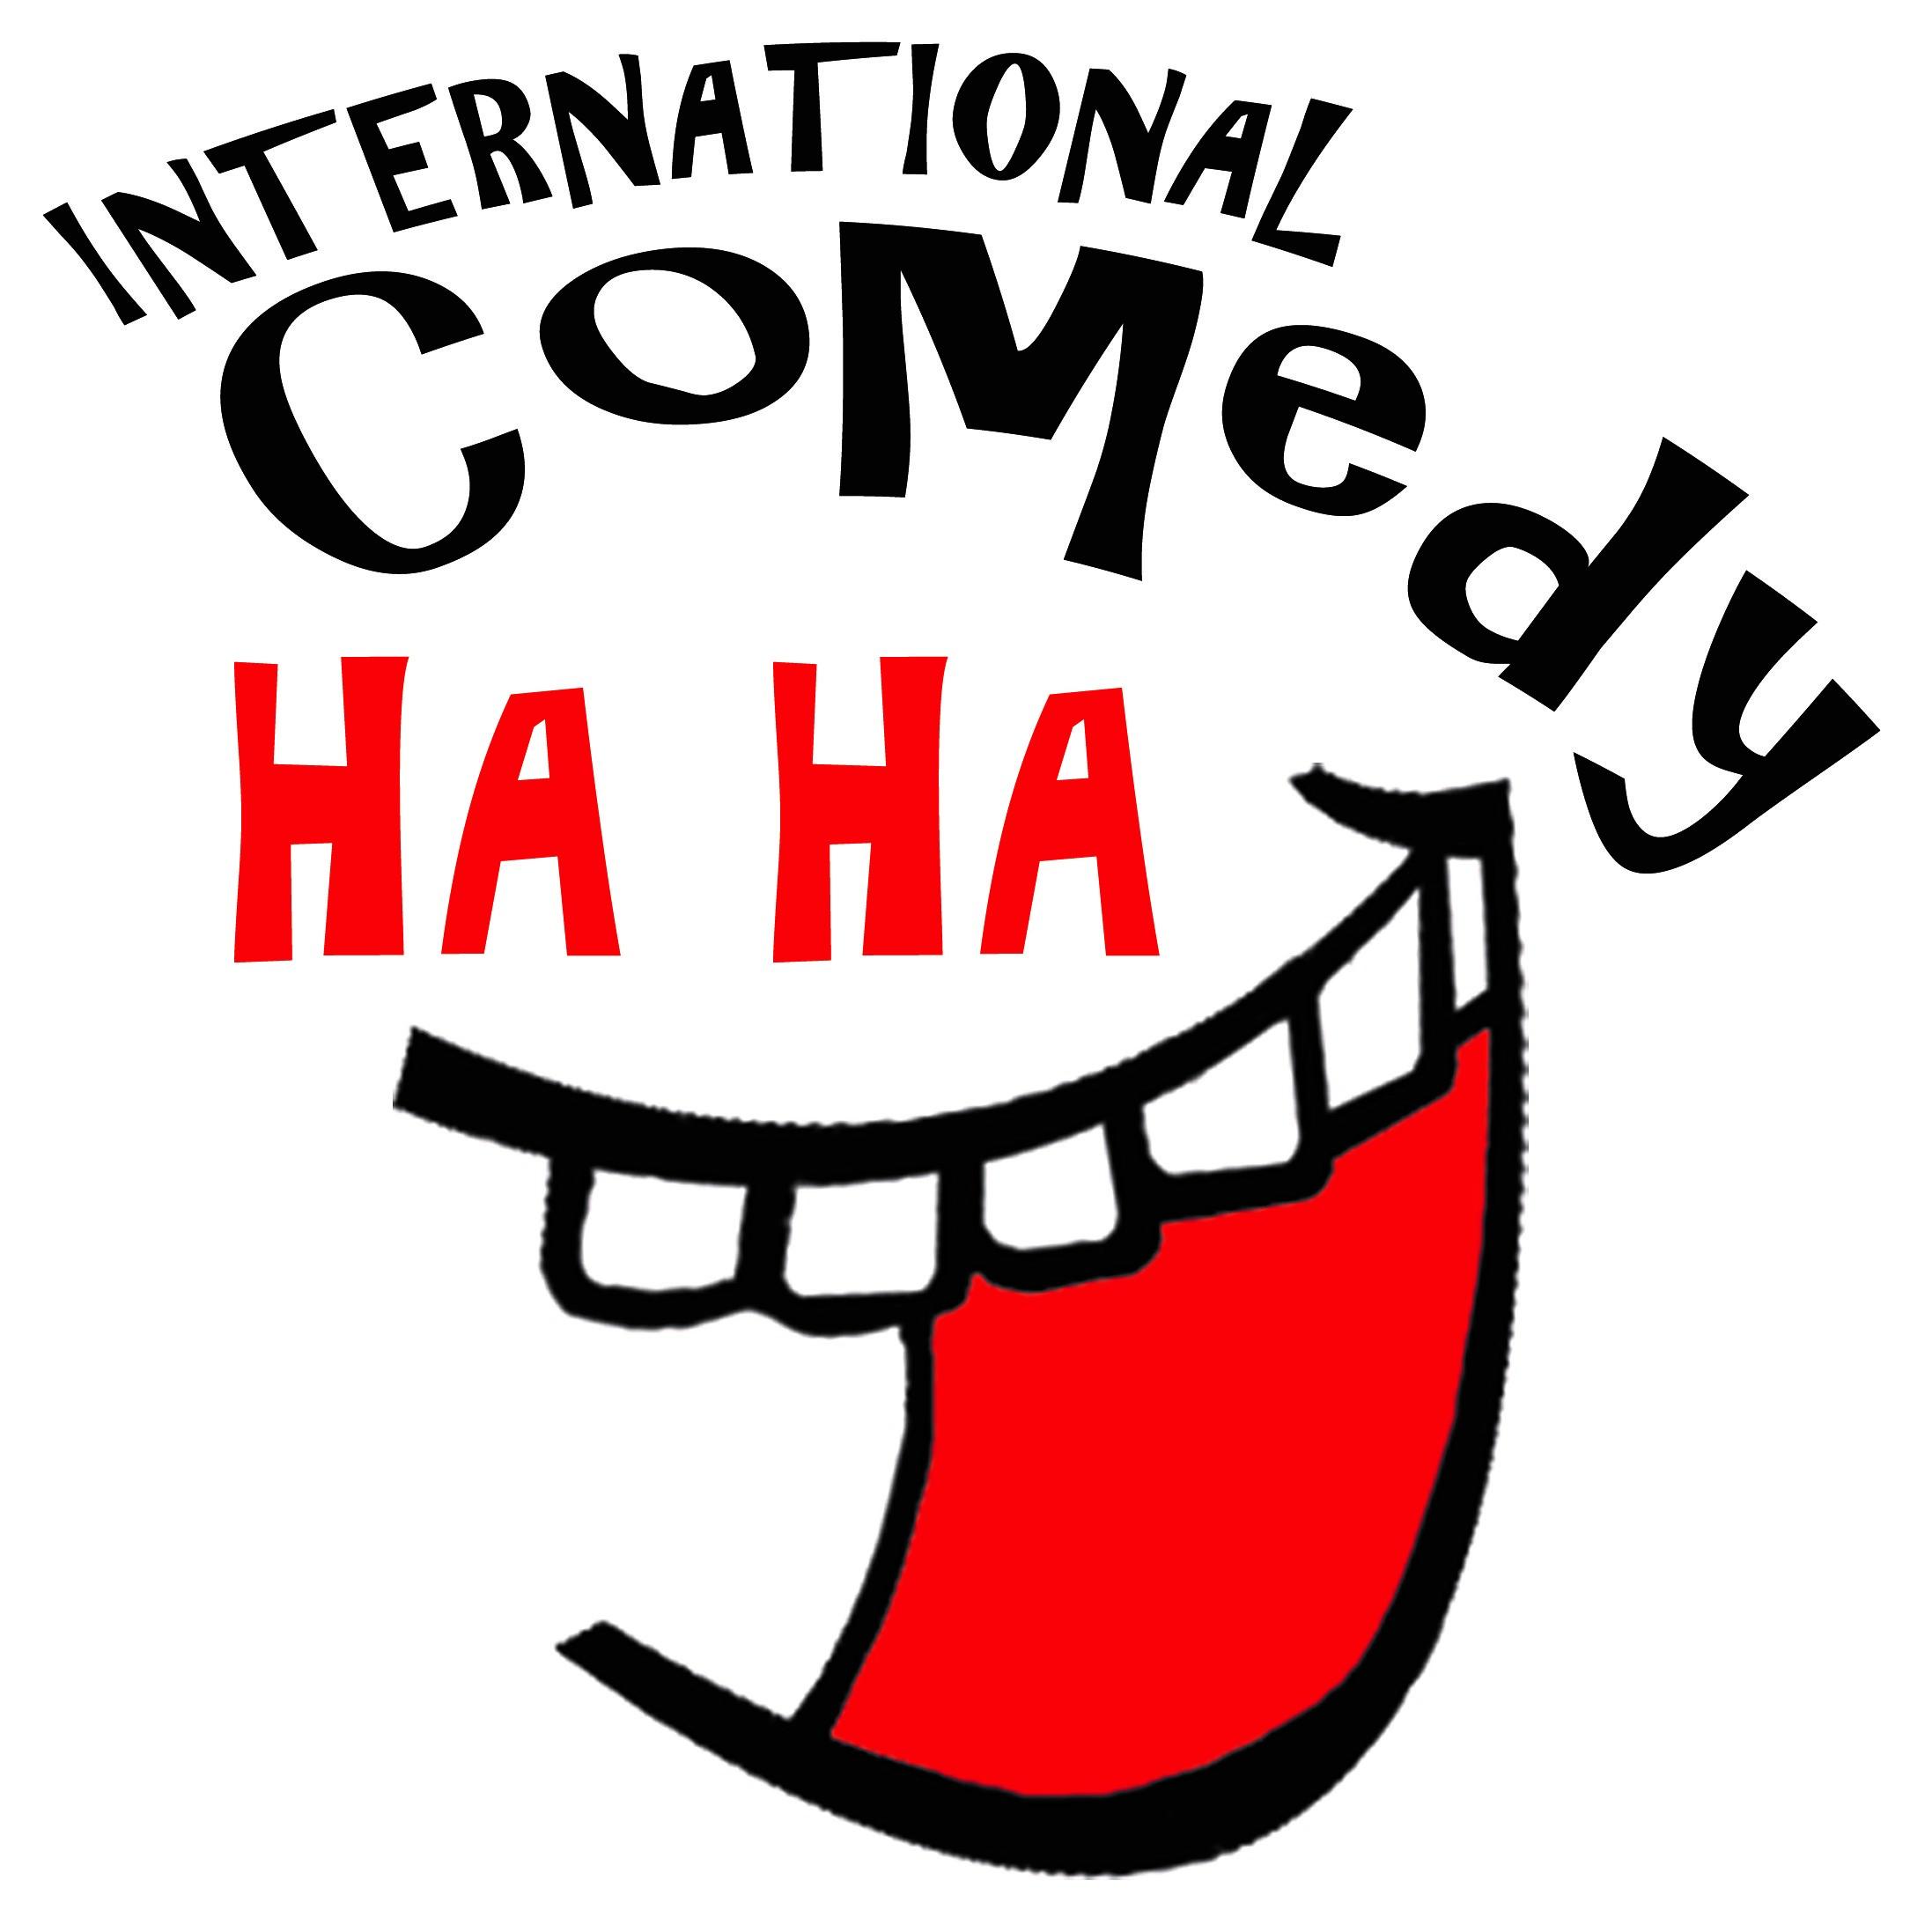 Bonkerz International Comedy Ha Ha